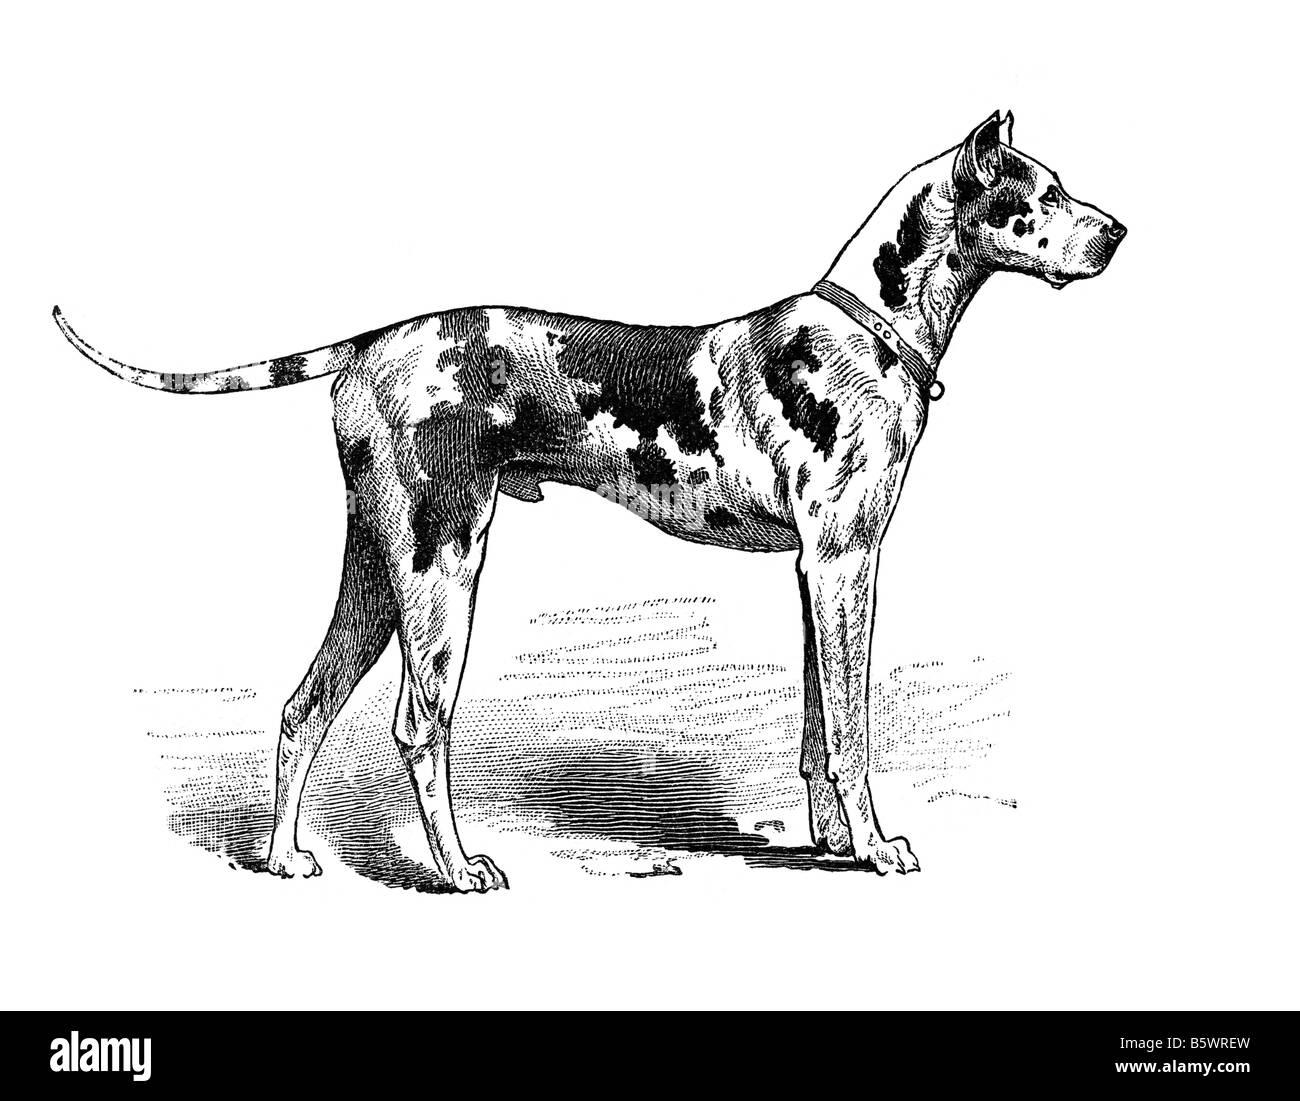 Great Dane, Danish Hound or German Mastiff domestic dog Canis lupus familiaris - Stock Image